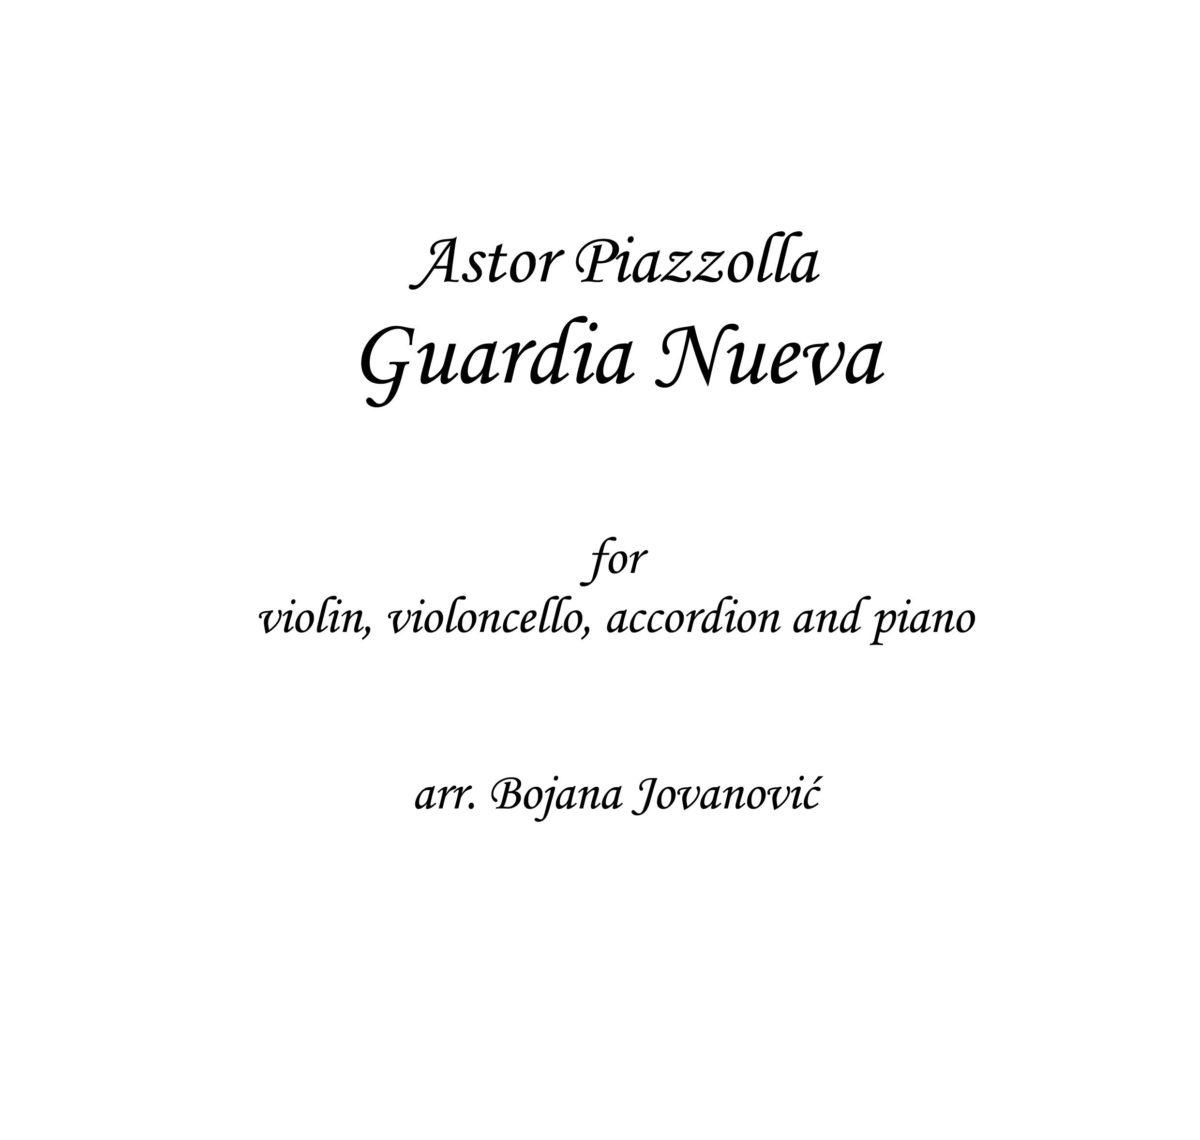 Guardia nueva Sheet music (Astor Piazzolla)